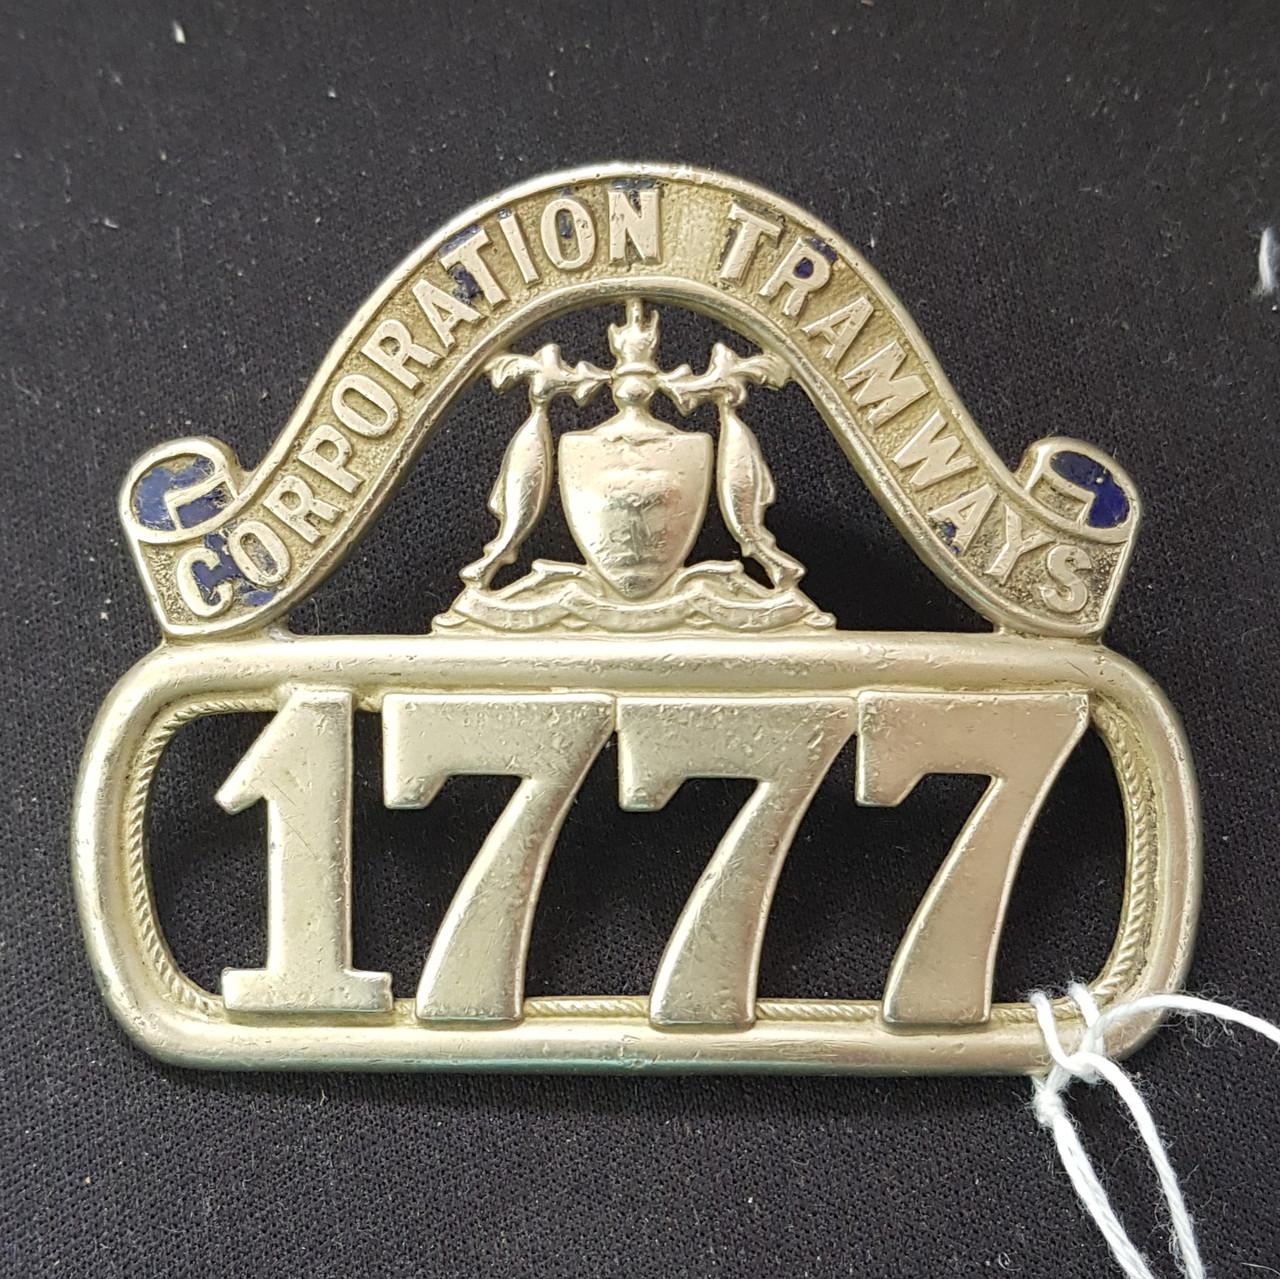 VT 3796A. GLASGOW CORPORATION TRAMWAYS CAP BADGE NO  1777.